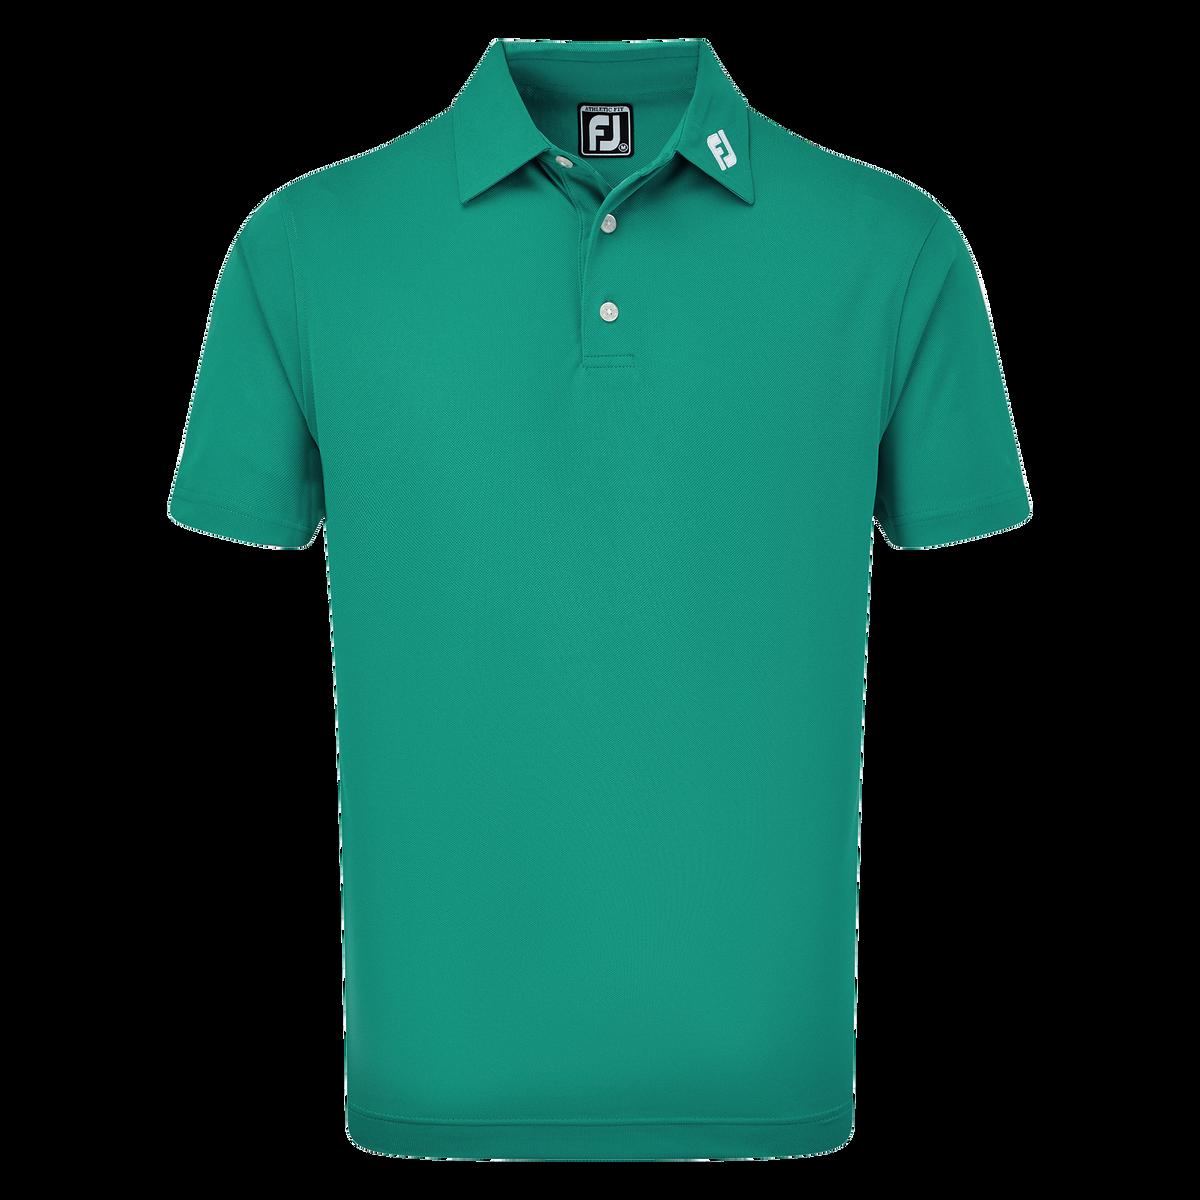 ProDry Performance Stretch Pique Solid Shirt